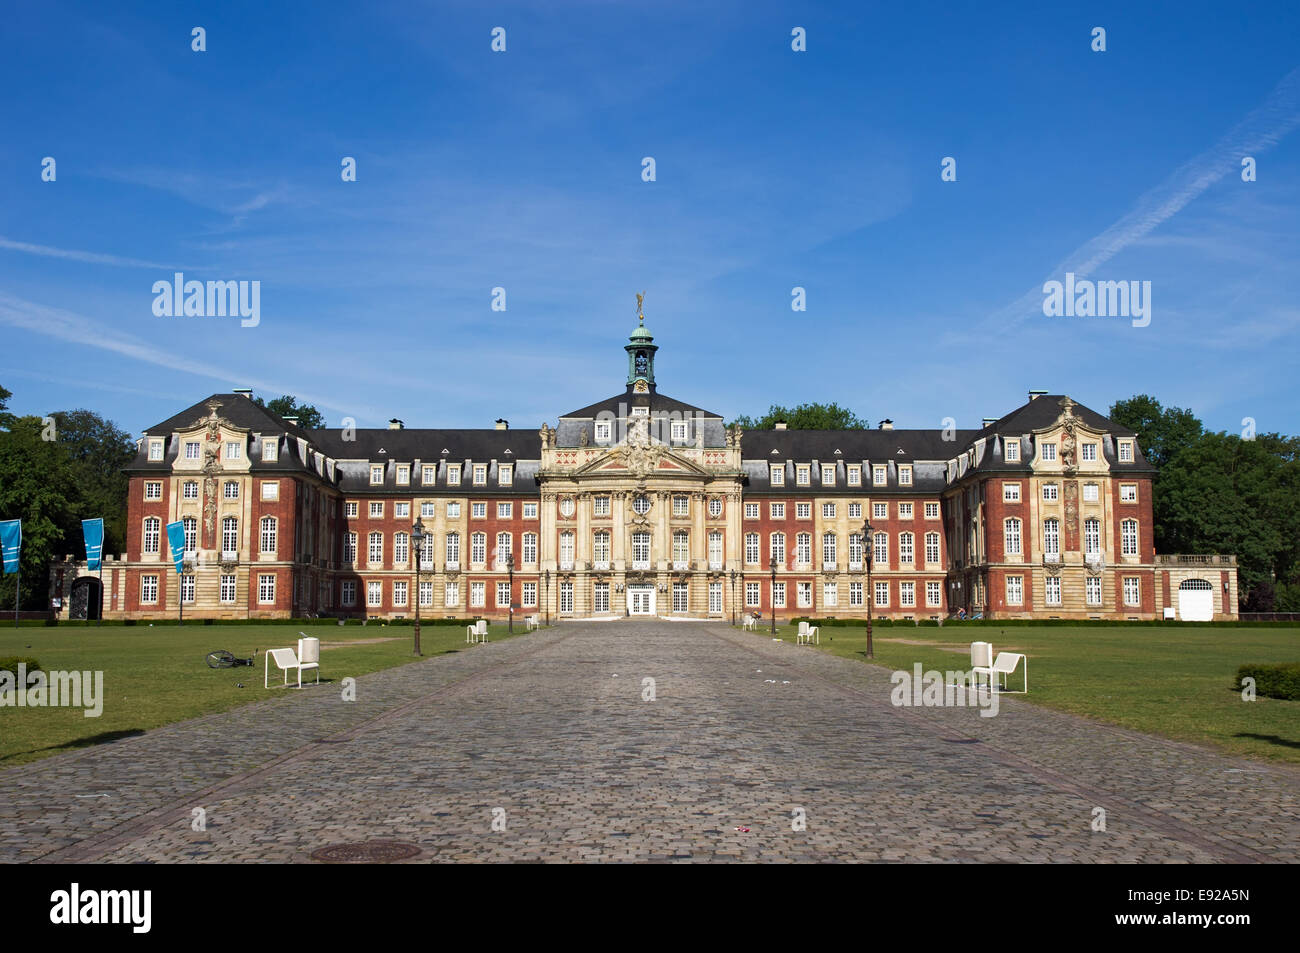 Castle of Muenster, Germany - Stock Image